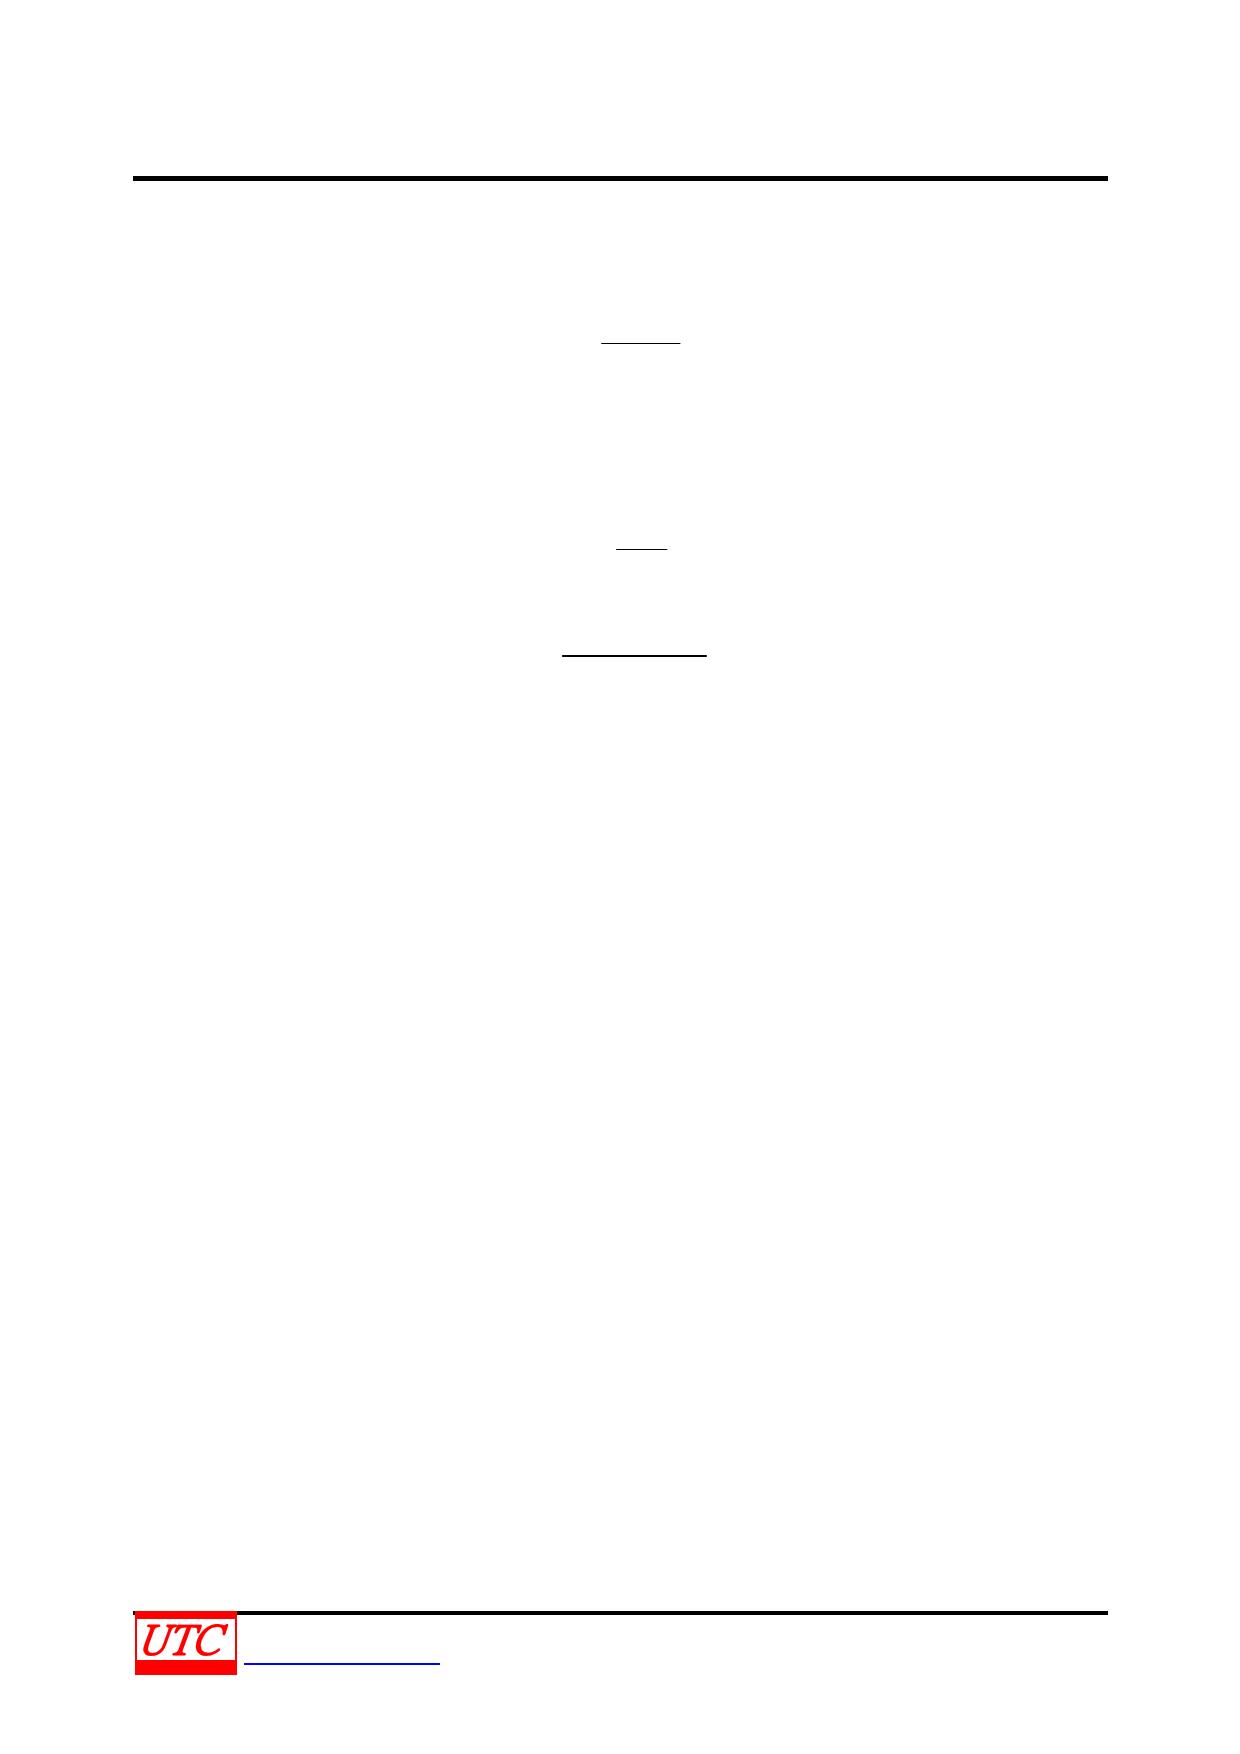 USL1601 pdf